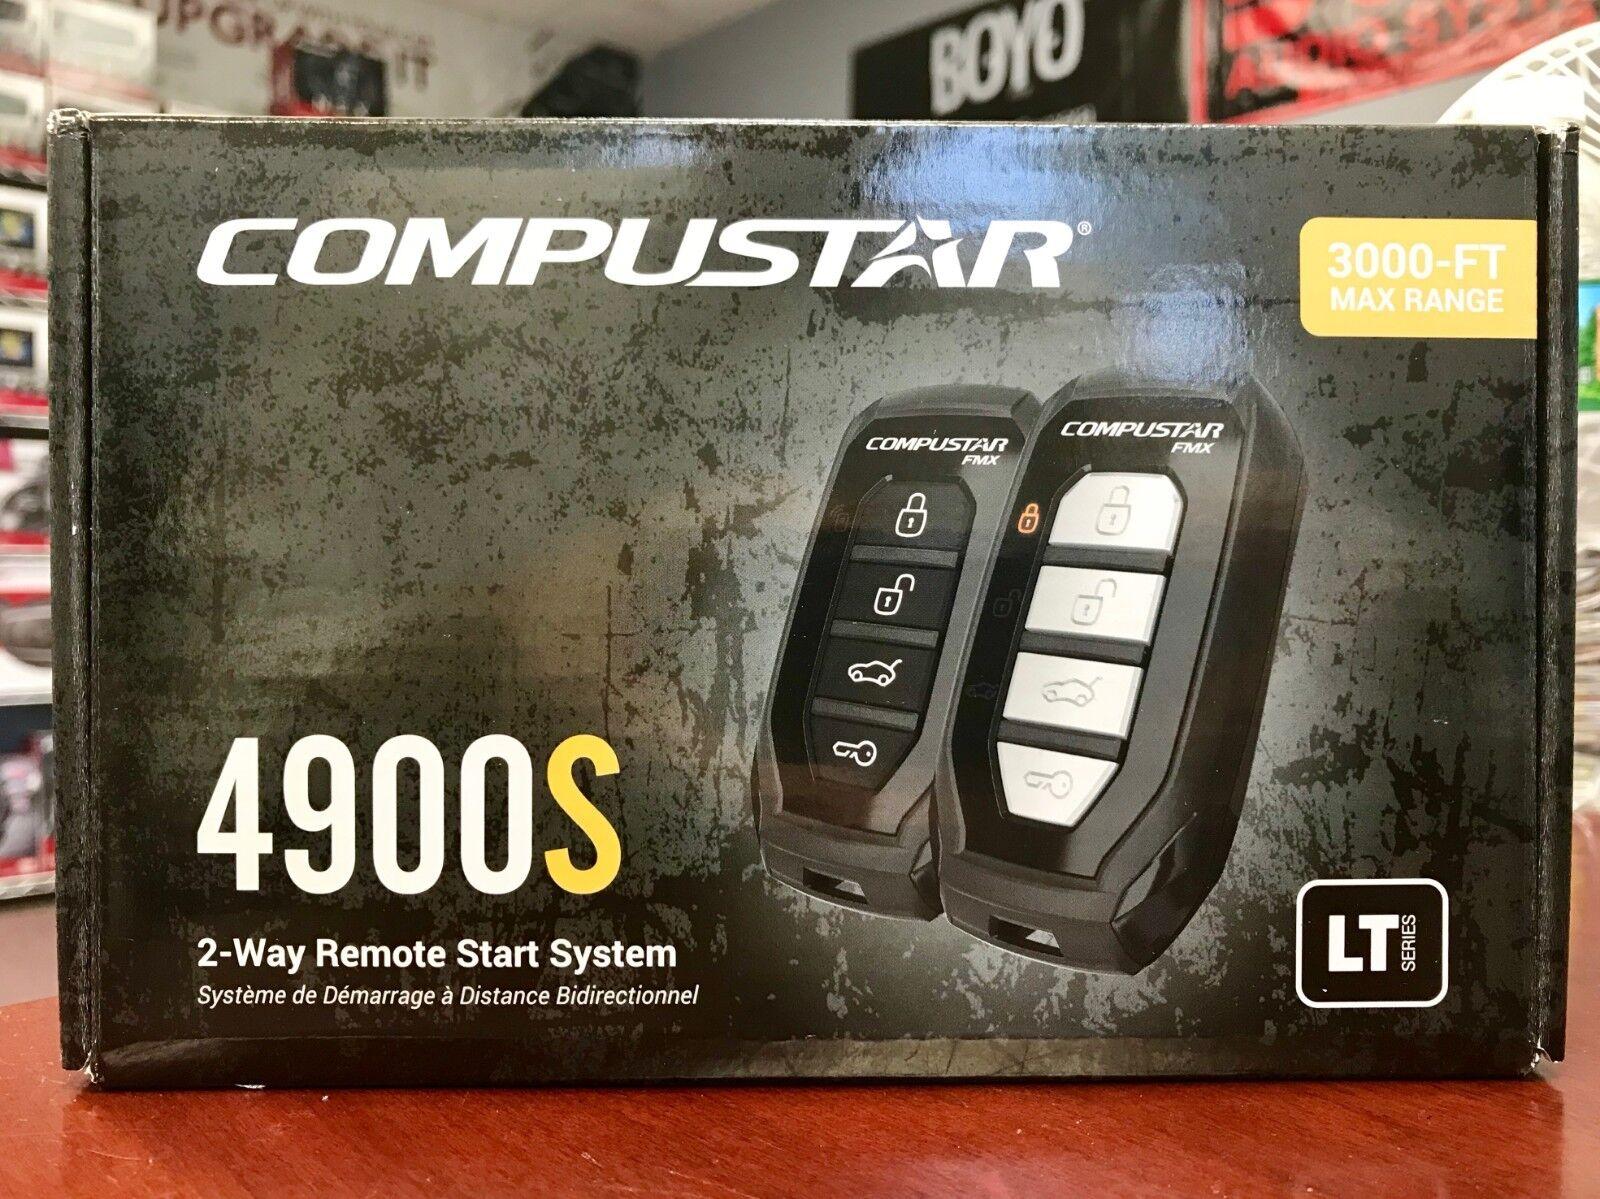 Compustar Cs4900s 2 Way Remote Start System 3000 Ft Range 4900s Ebay 2012 Dodge Ram Starter Norton Secured Powered By Verisign